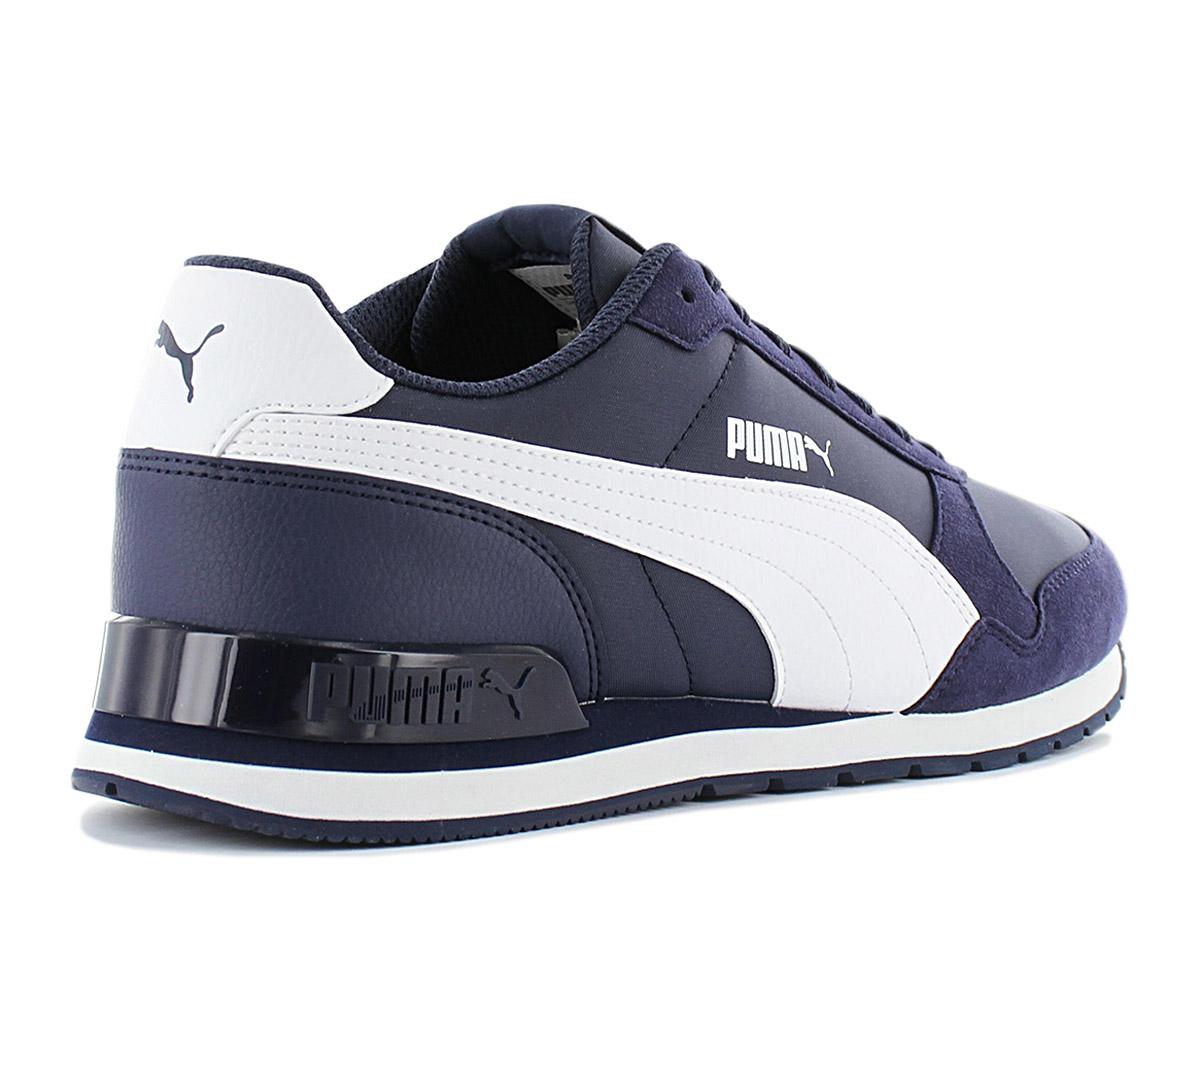 Details about Puma st Runner V2 Nl Men's Sneaker 365278 08 Blue Shoes Leisure Shoe New